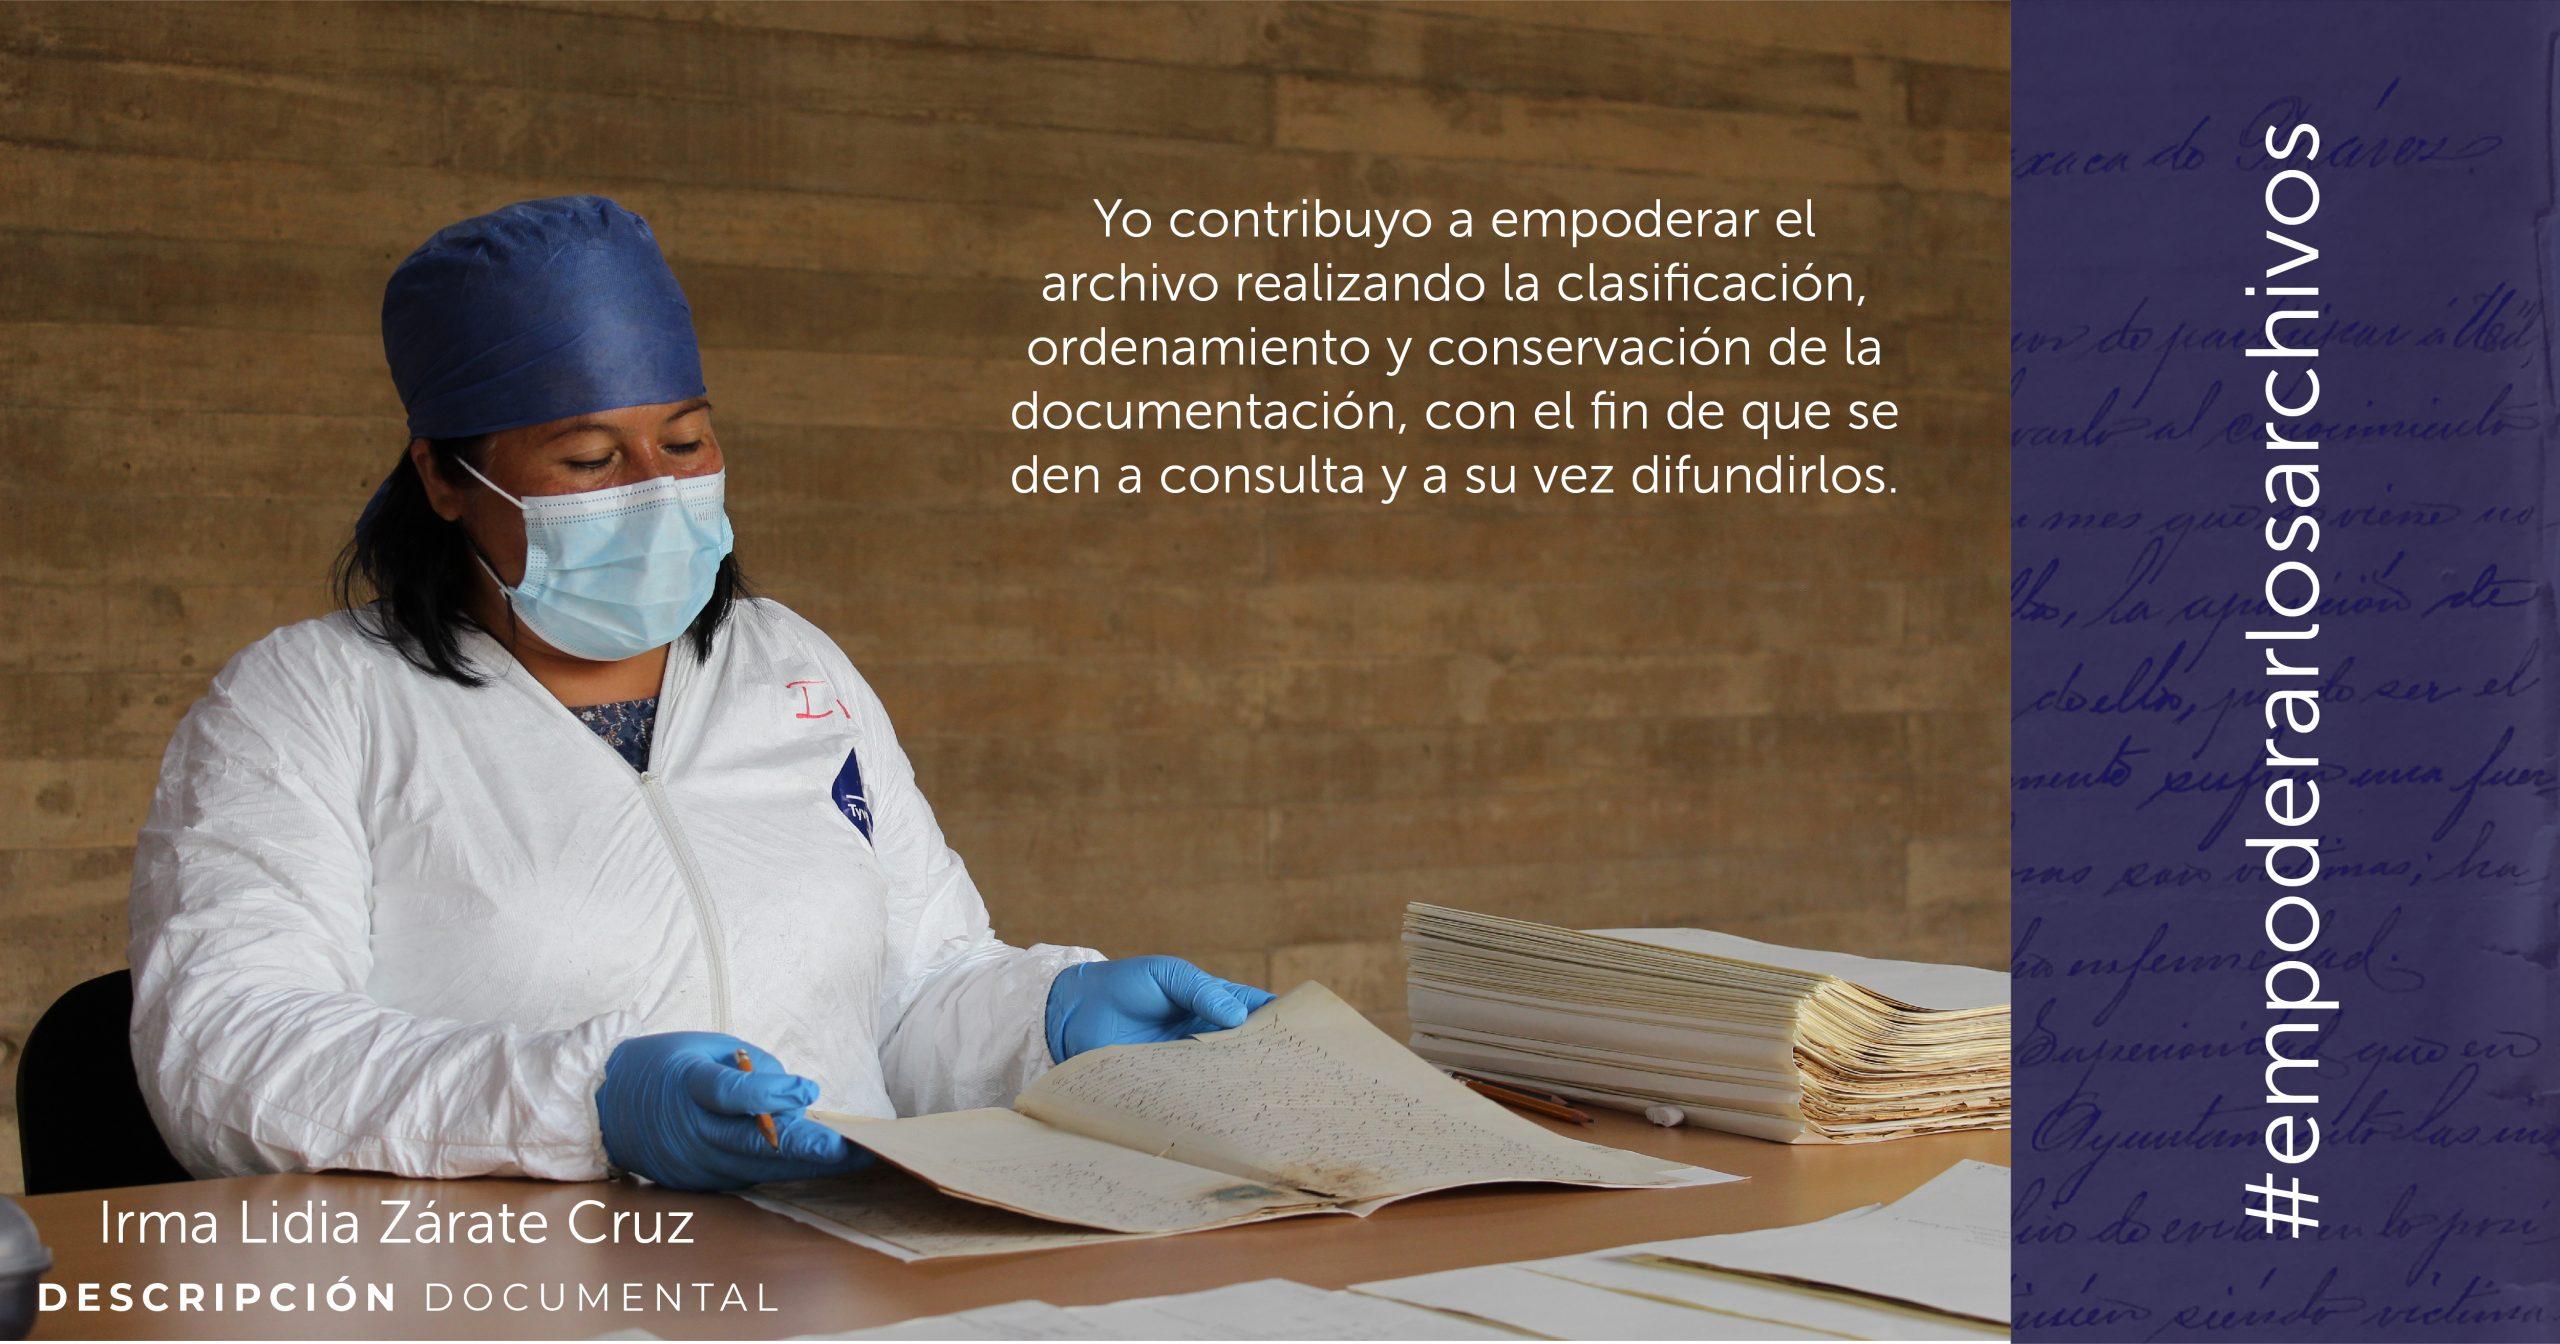 DIADELOSARCHIVOS21-04